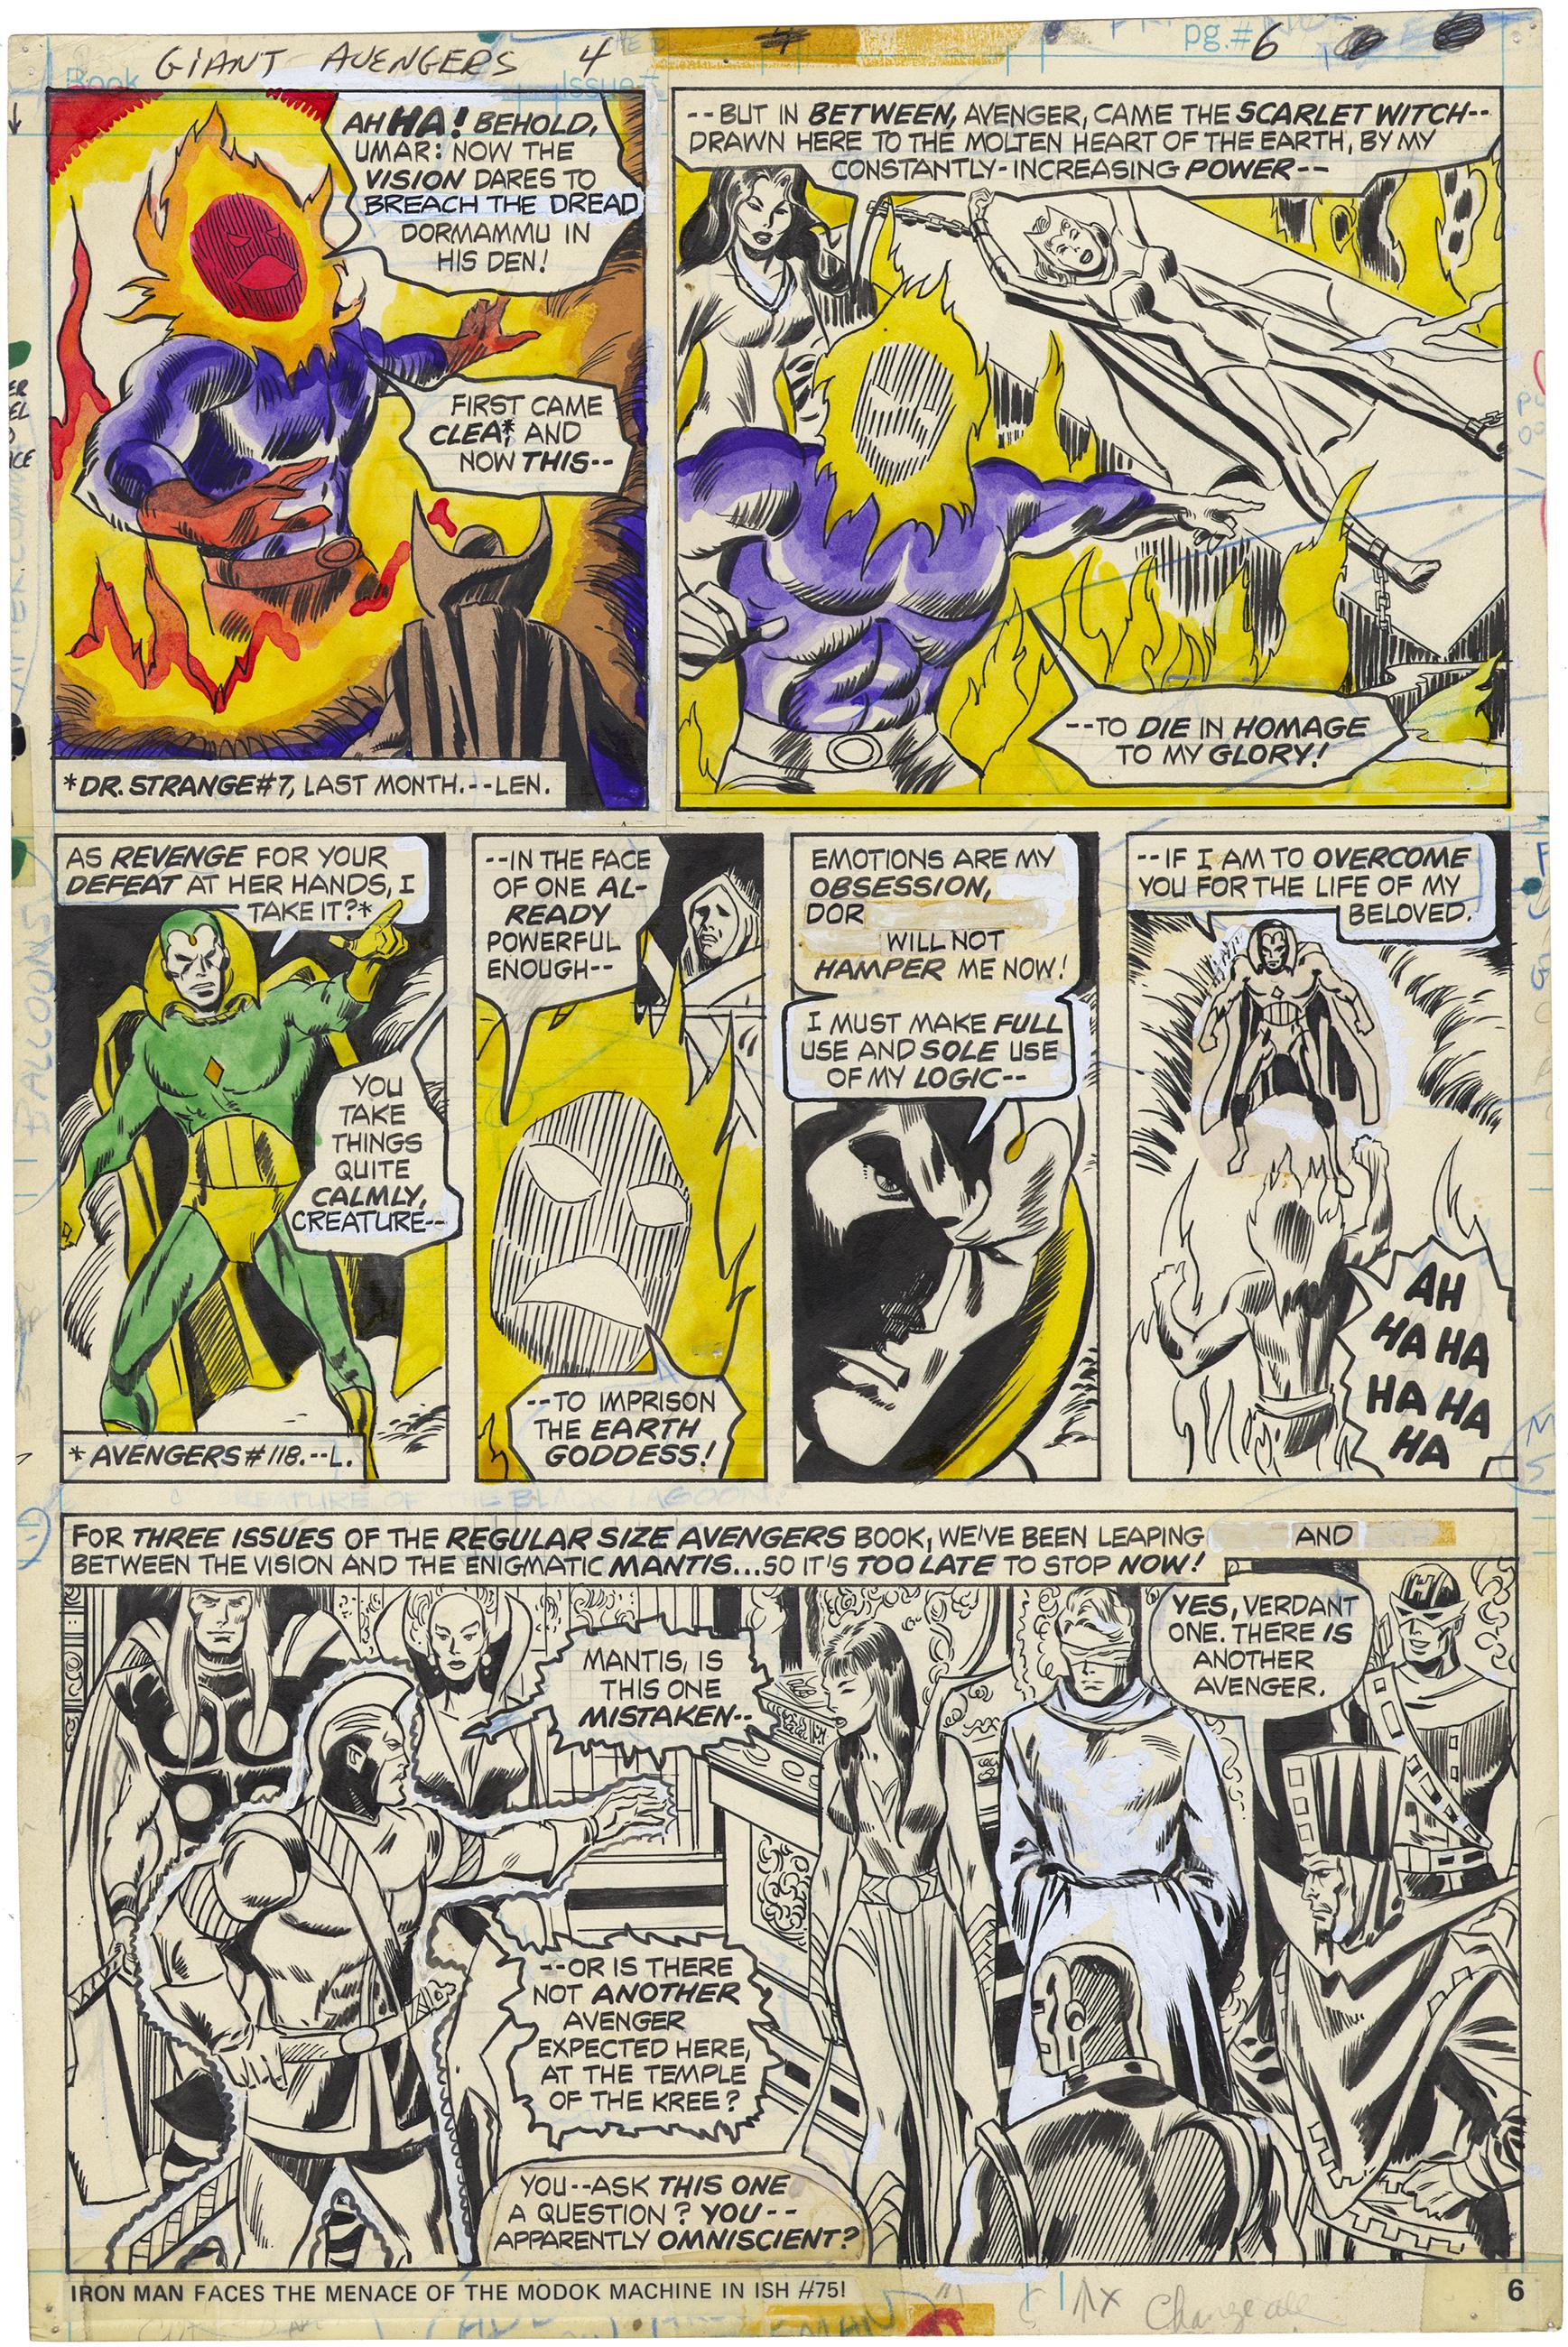 Giant-Size Avengers #4 p6